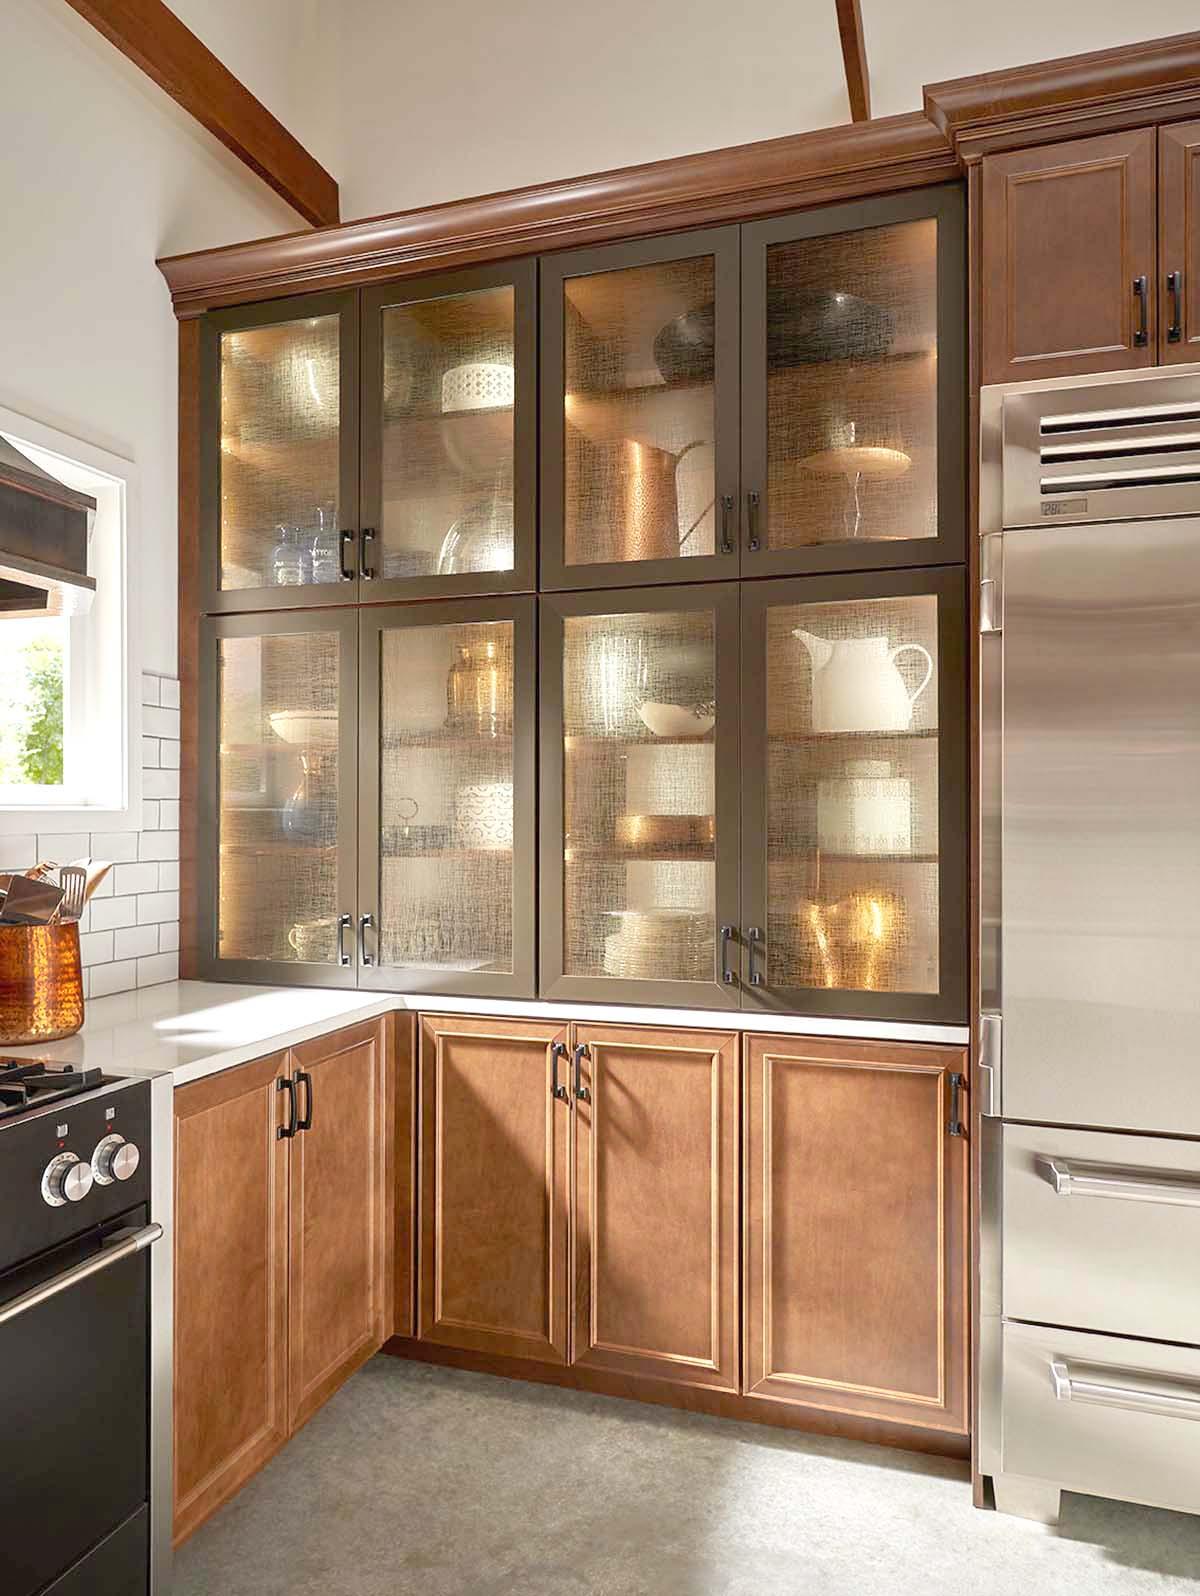 Installing glass in kitchen cabinet doors installing glass for Add glass to kitchen cabinets